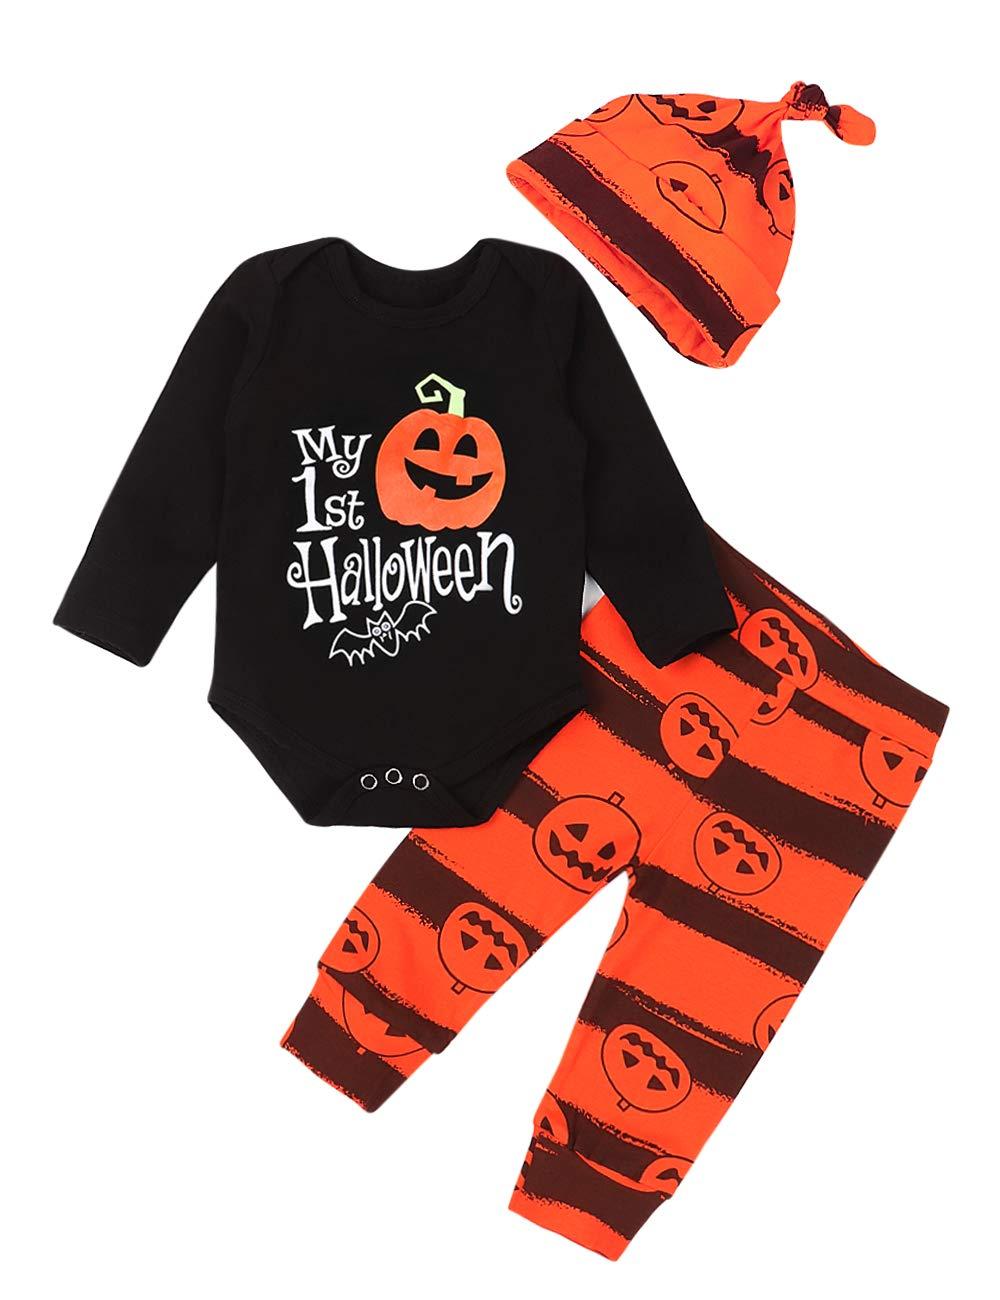 Baby Boy Girl Halloween Outfits My First Halloween Pumpkin Romper Bodysuit+Pants+ Cute Hat 3Pcs Clothes Set